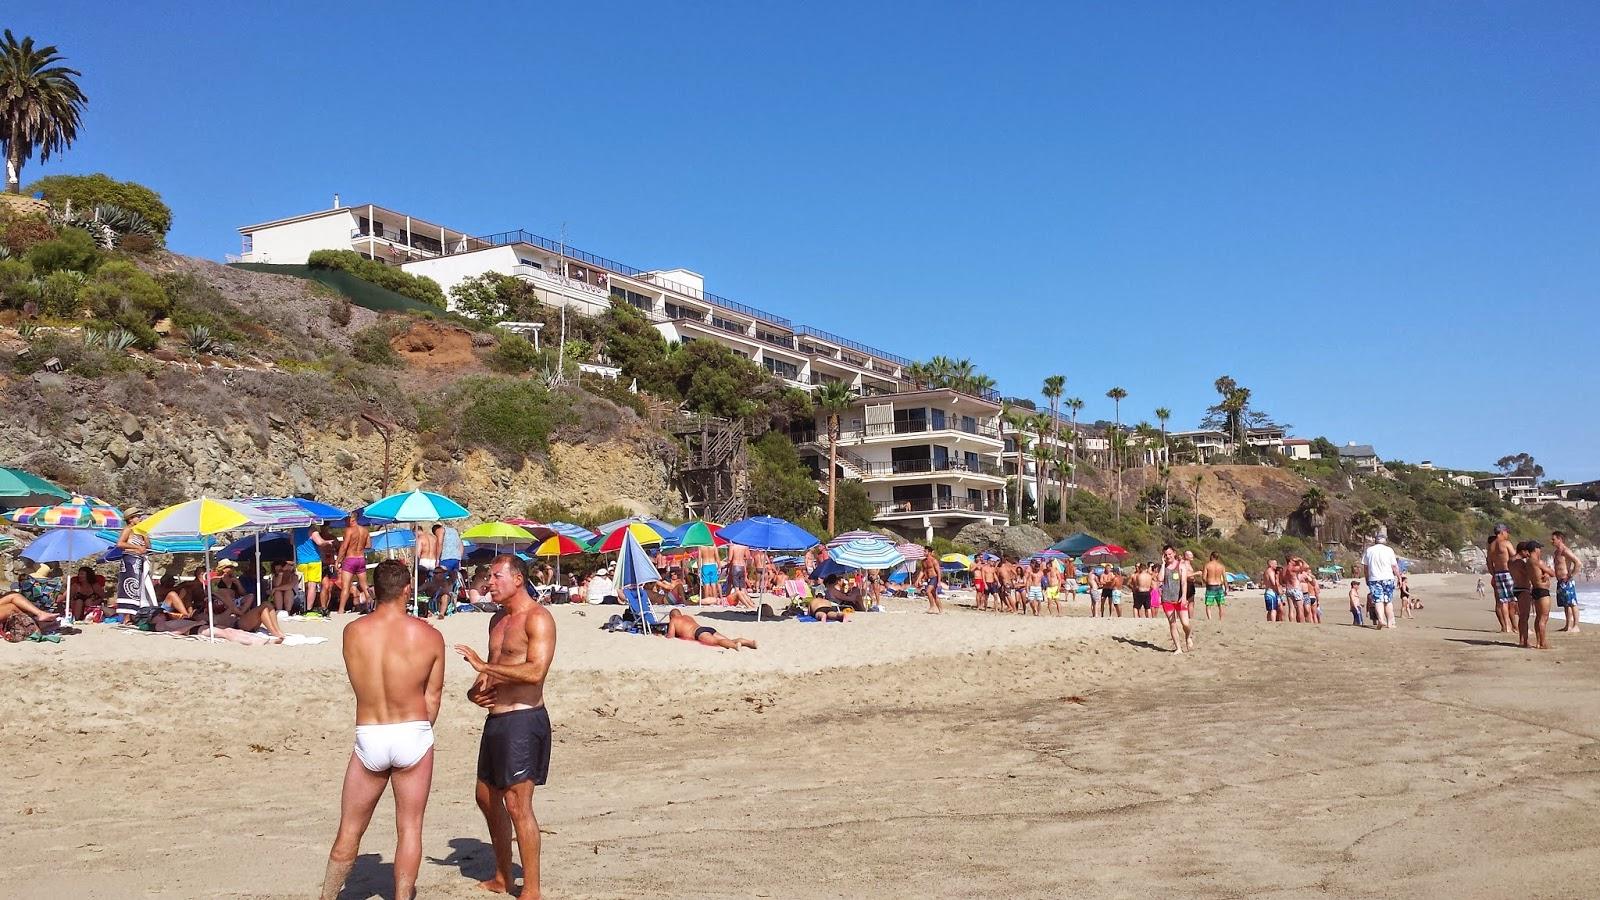 ca Gay beach hotel laguna